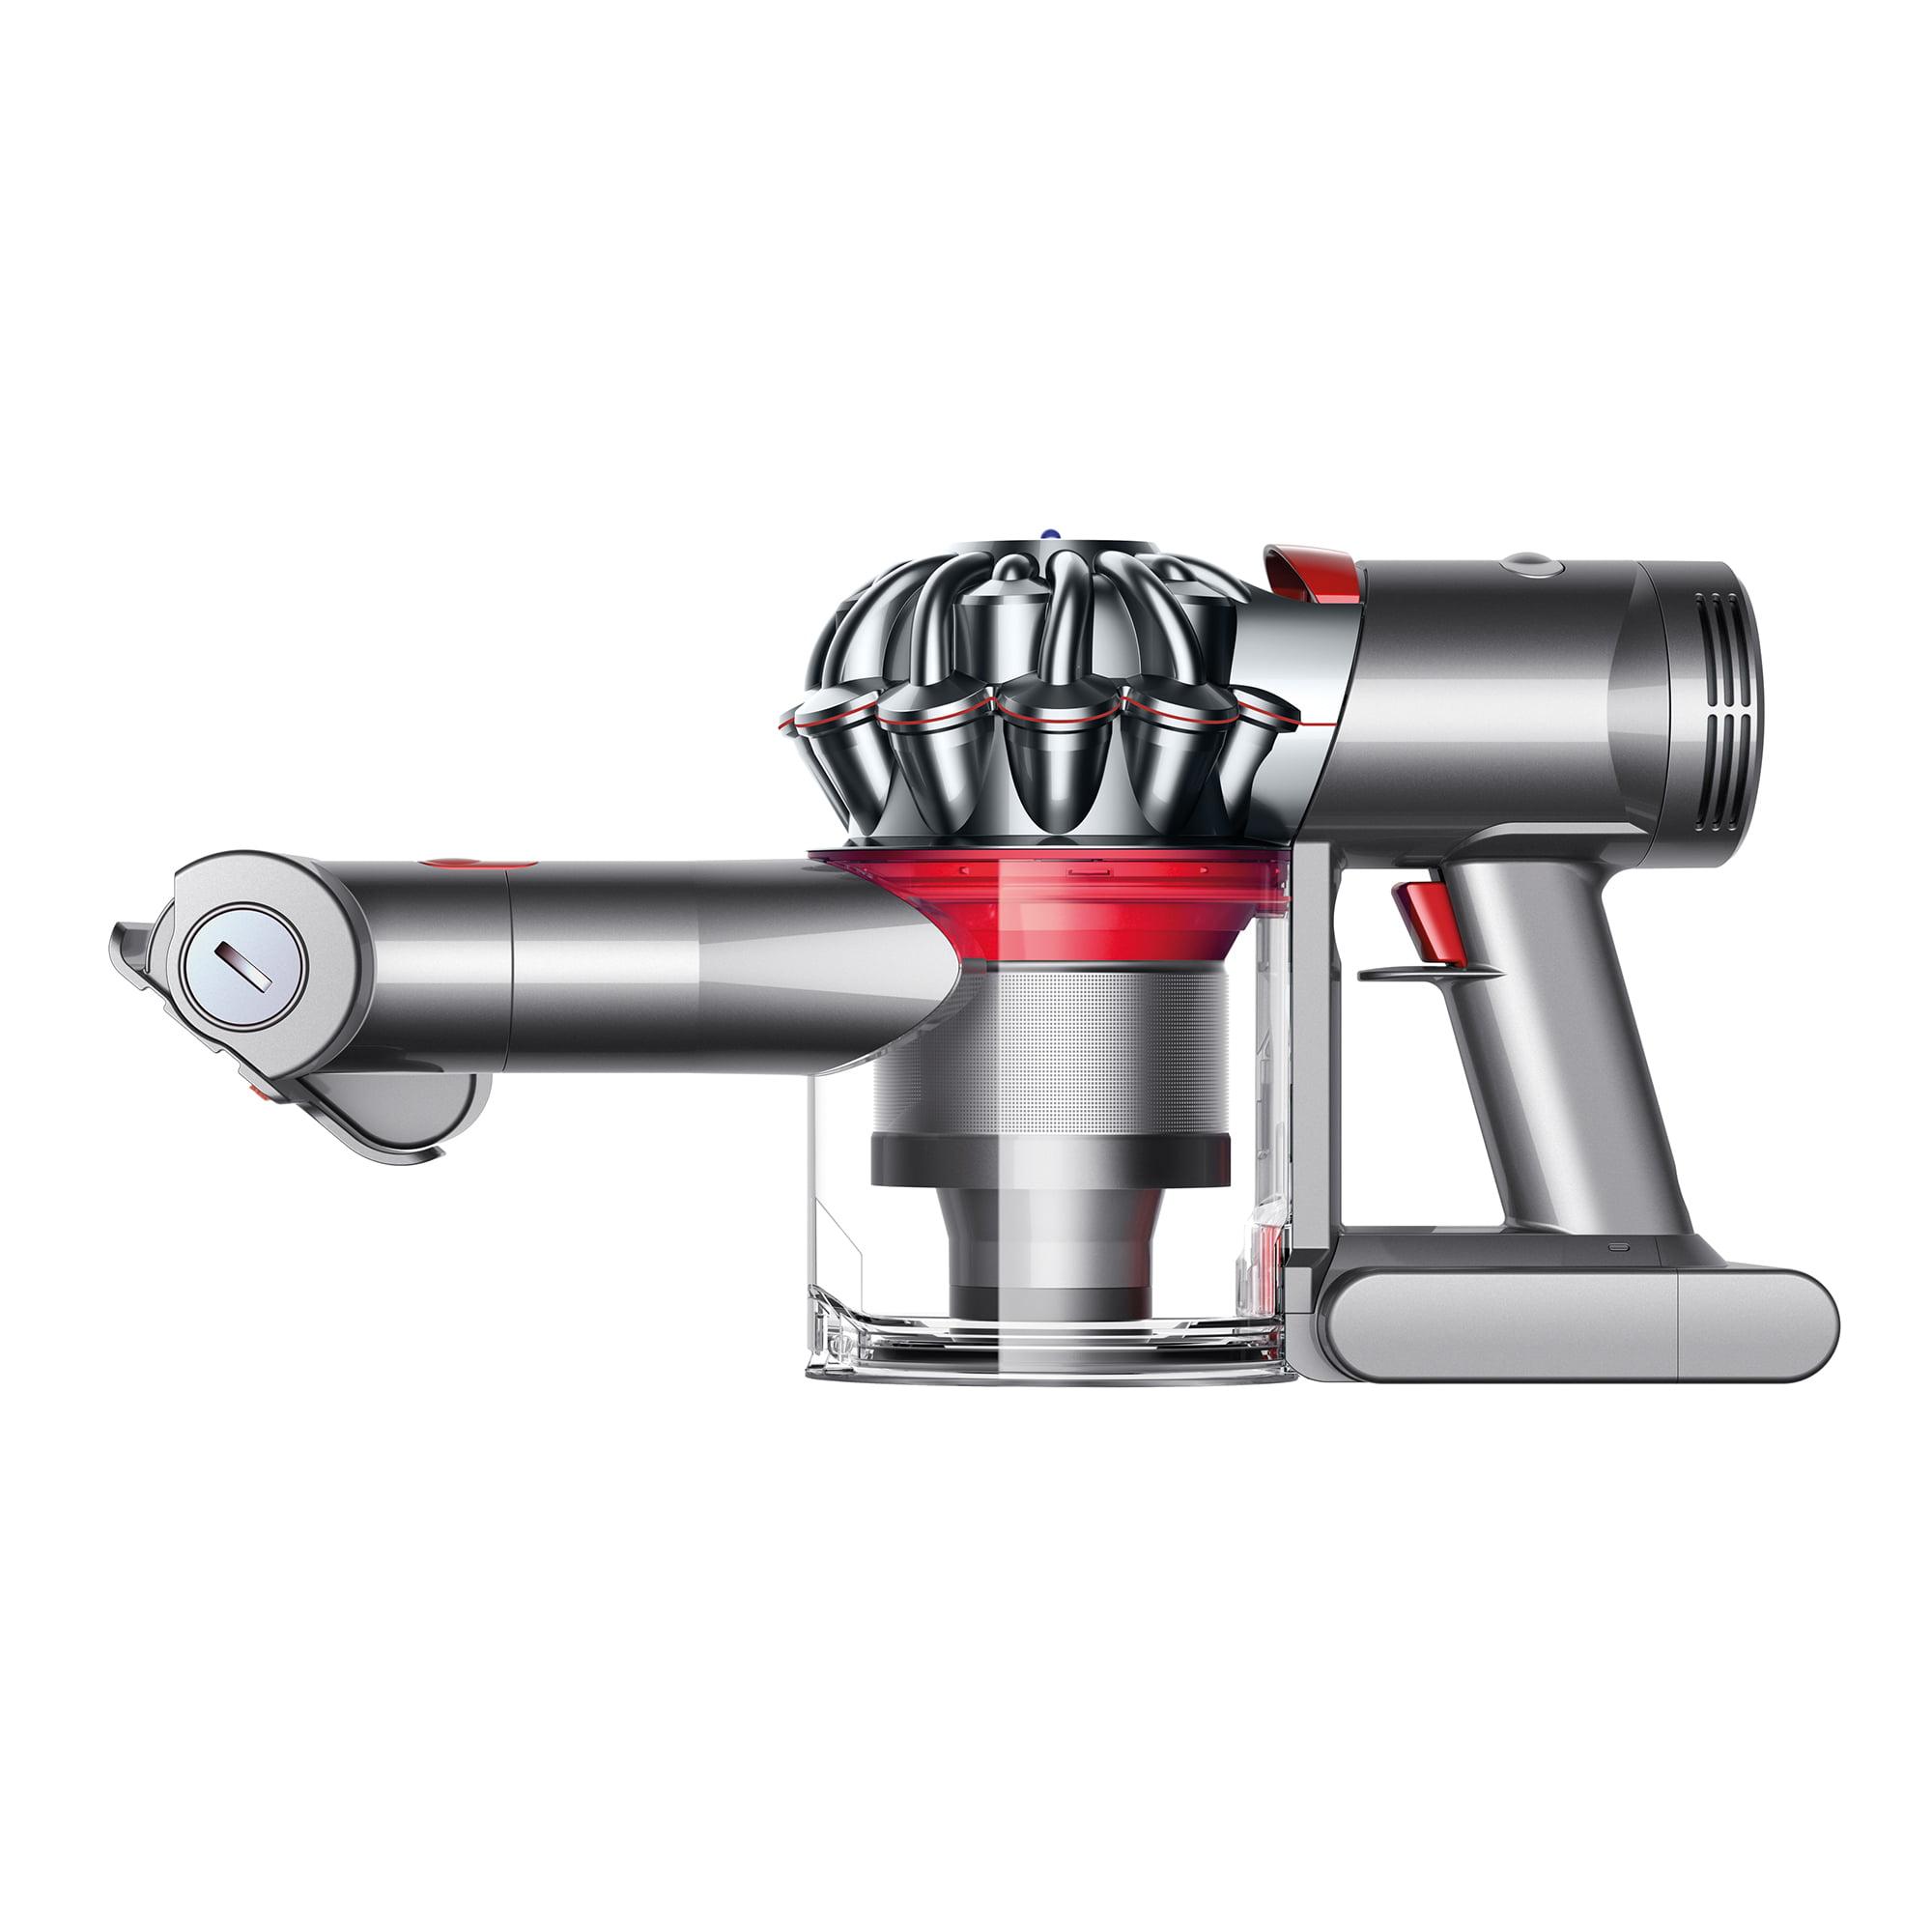 Dyson V7 Trigger Cordless Handheld Vacuum, 231770-01